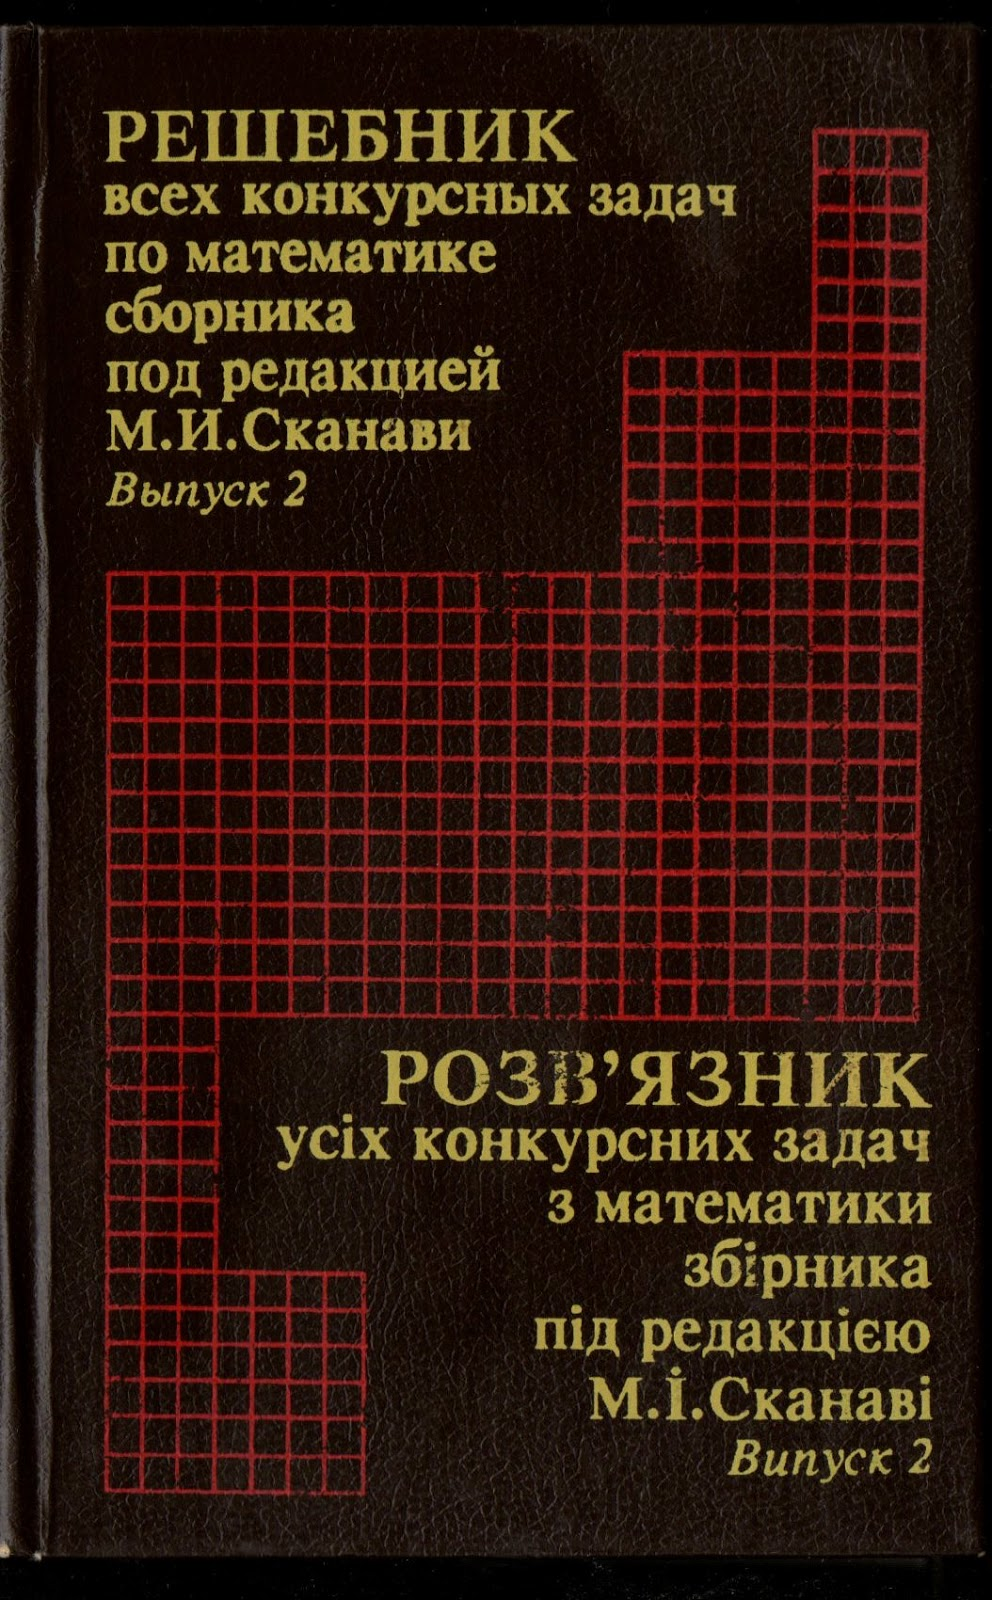 Сборнику решебник задач беняш-кривец в.в по математики